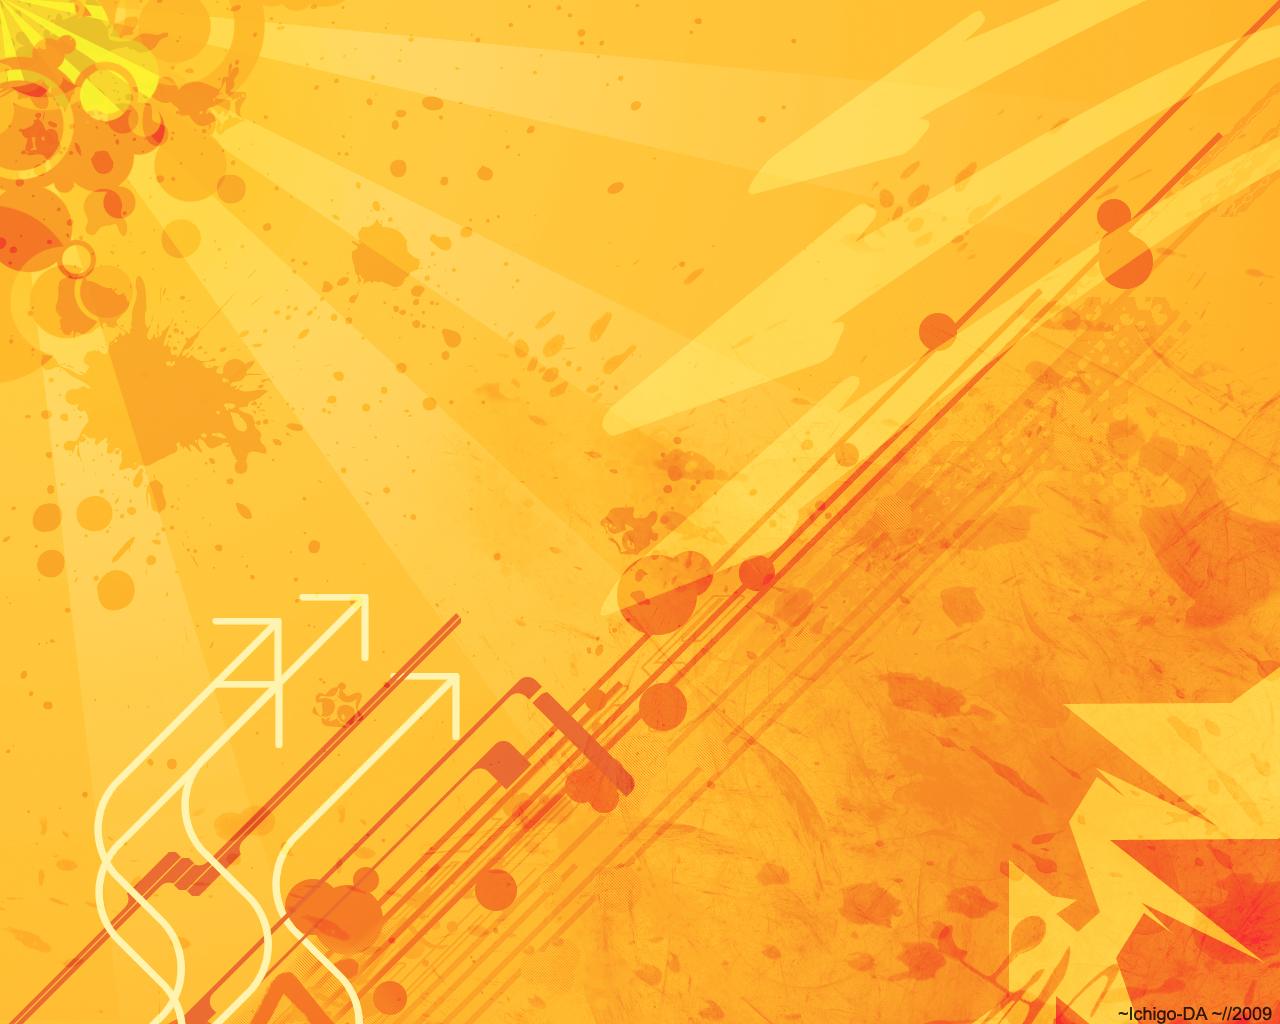 http://2.bp.blogspot.com/-Hv8zdmd5Y2s/Ta9Xc4mV64I/AAAAAAAAHkY/iYDT0OASE3g/s1600/Orange_Wallpaper_by_Ichigo_DA.jpg